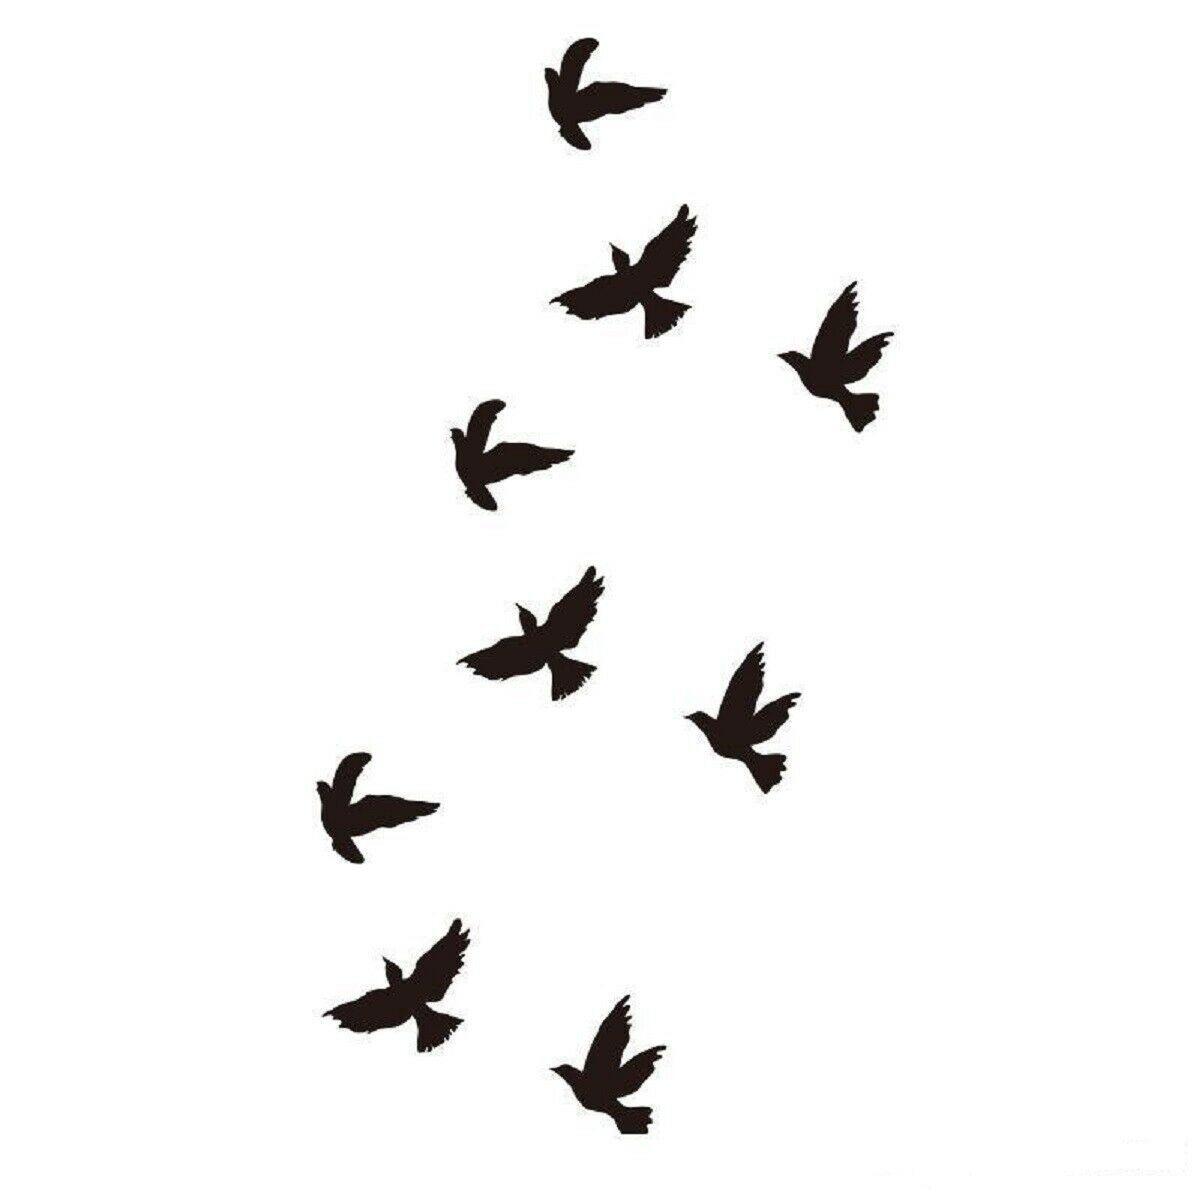 Arm Temporary Tattoos Art Sticker Waterproof Women Small Birds Fly